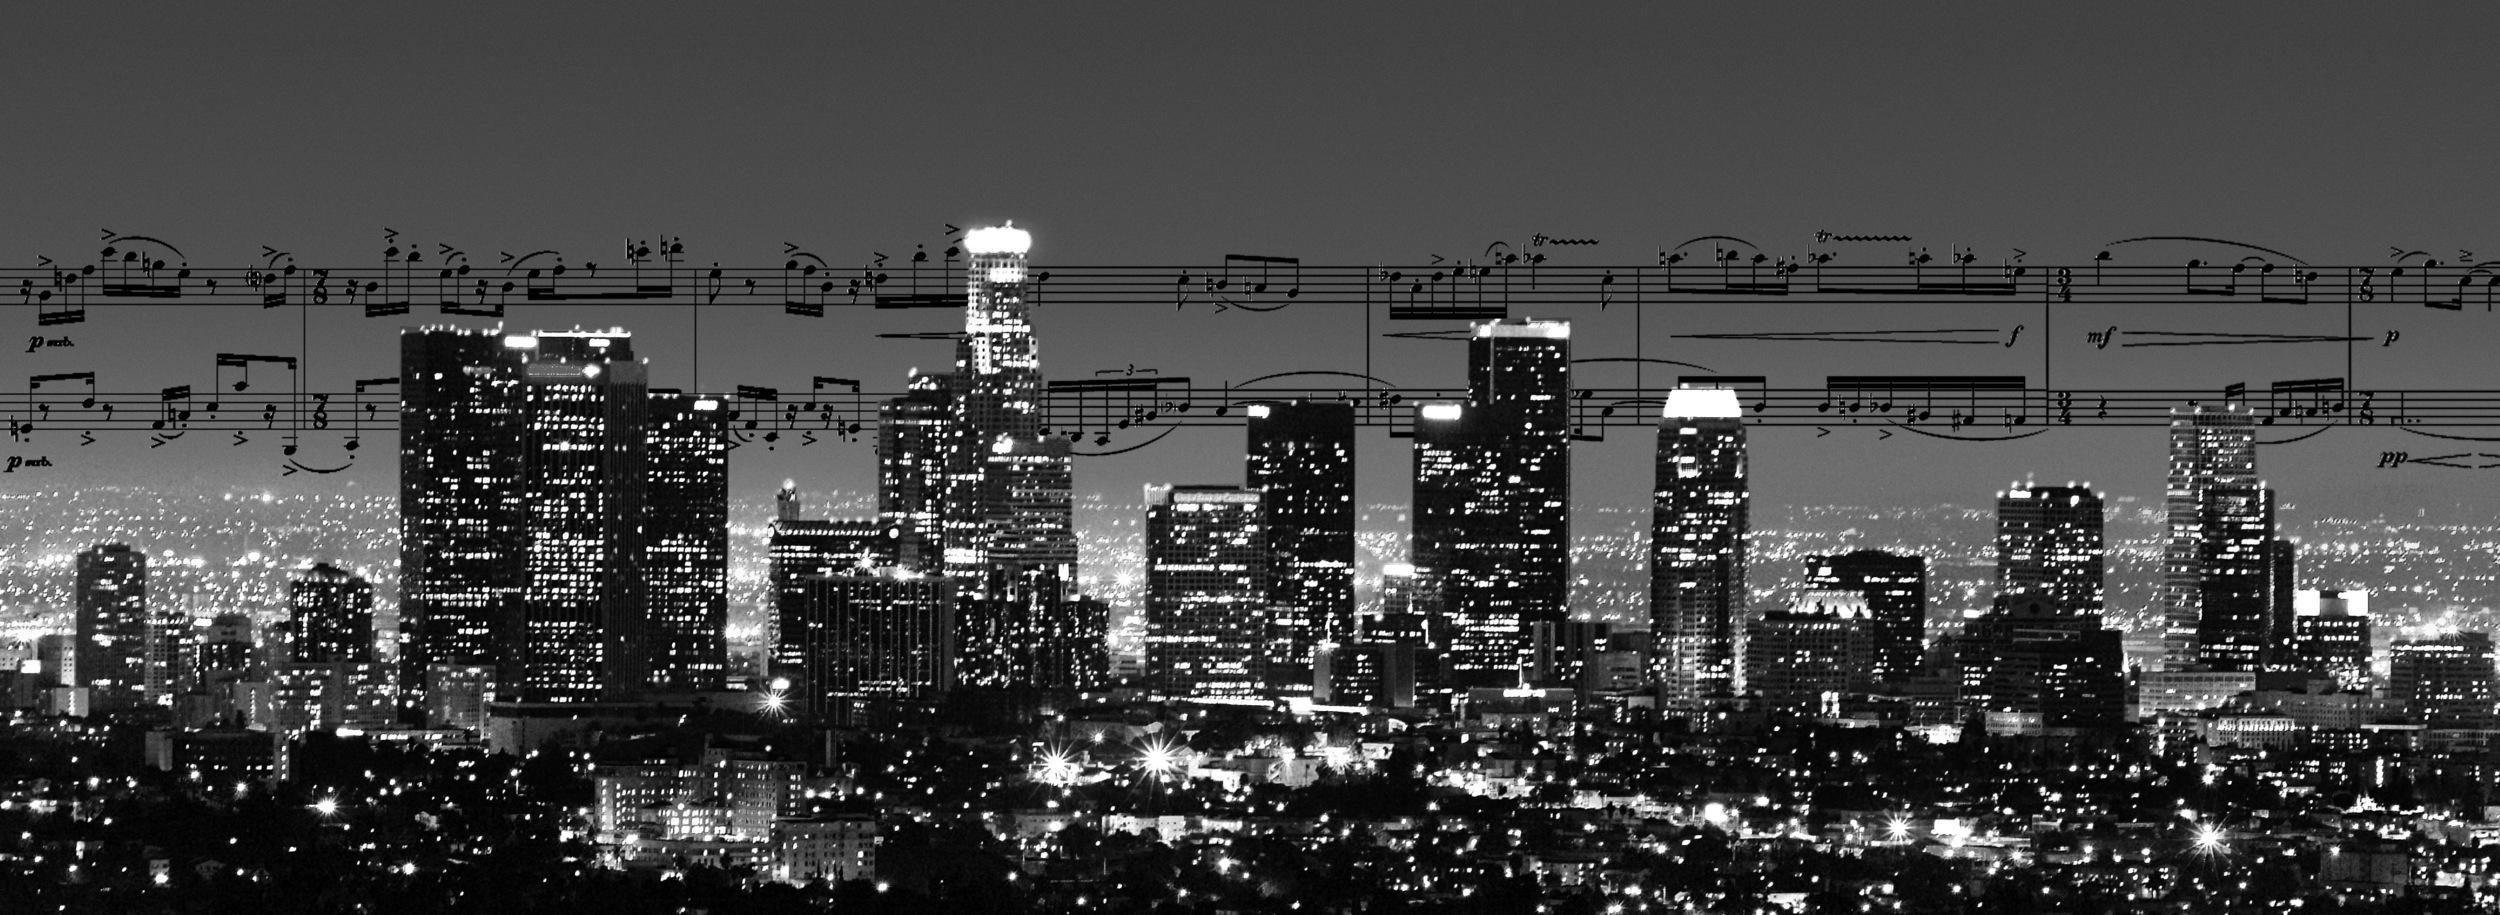 title page skyline